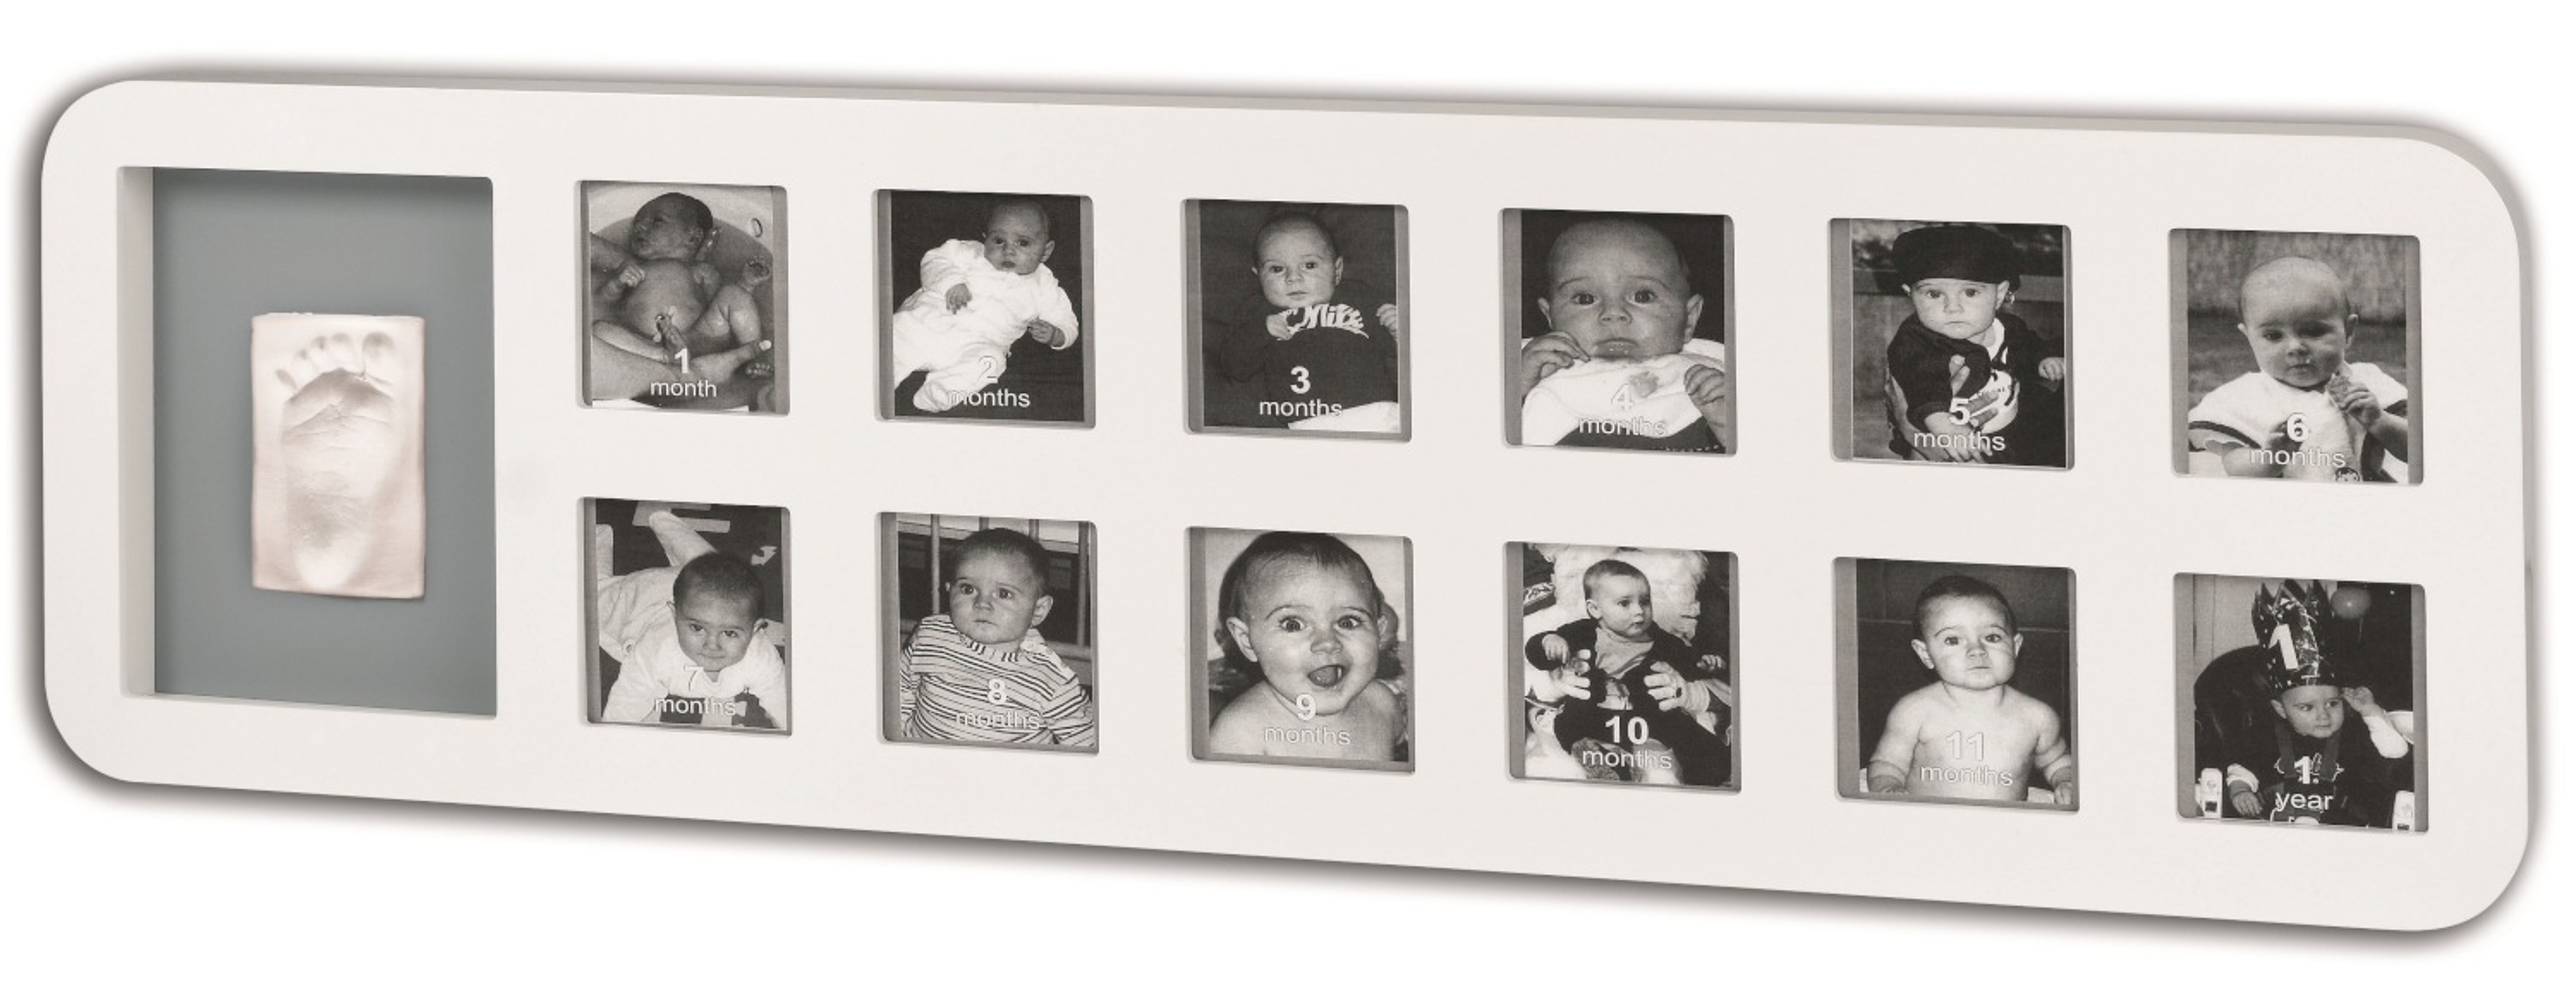 Baby art 1 st year print frame